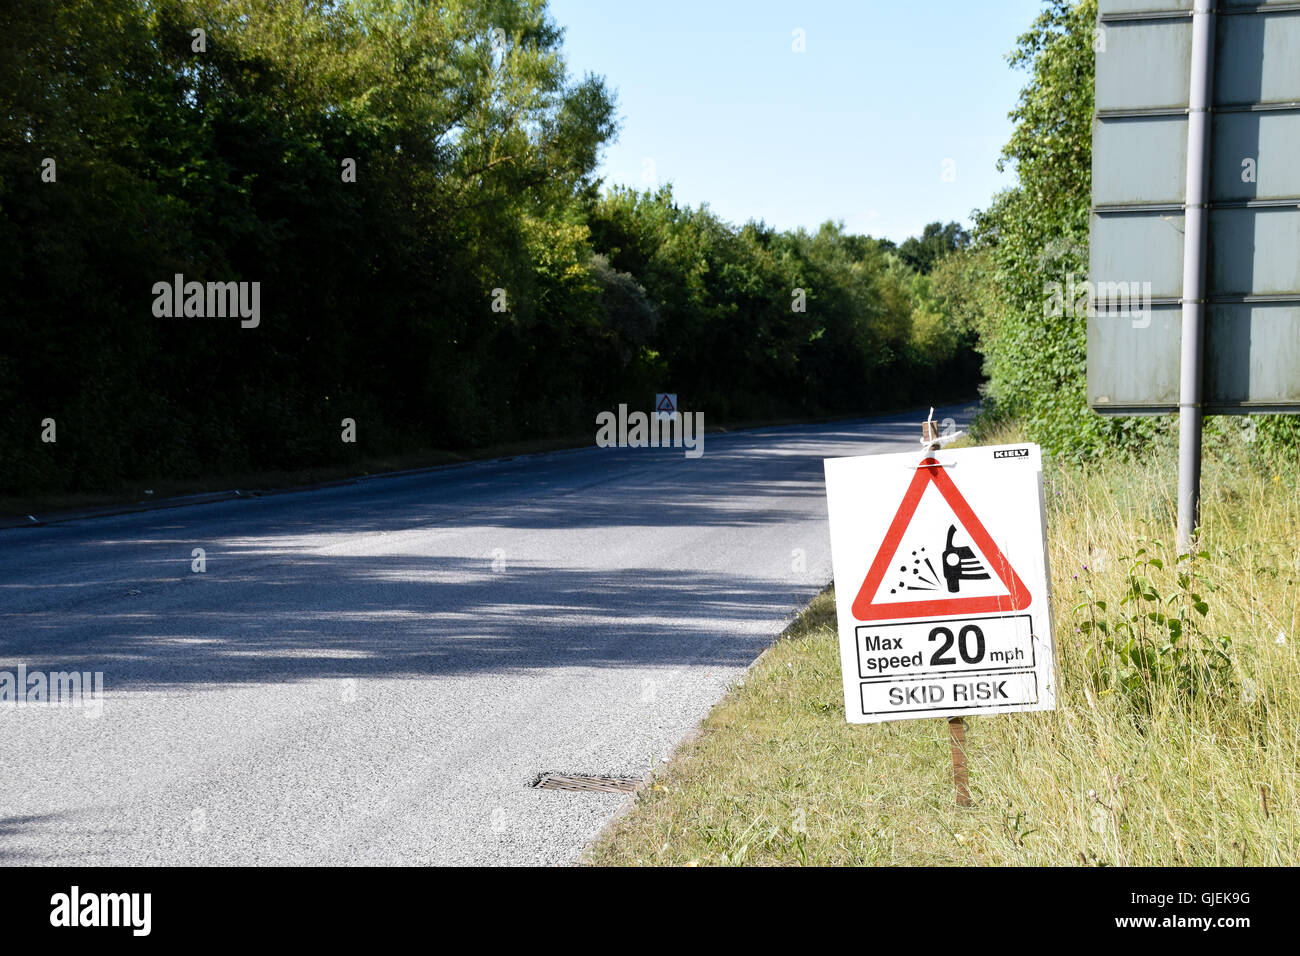 Skid risk warning on newly laid road - Stock Image